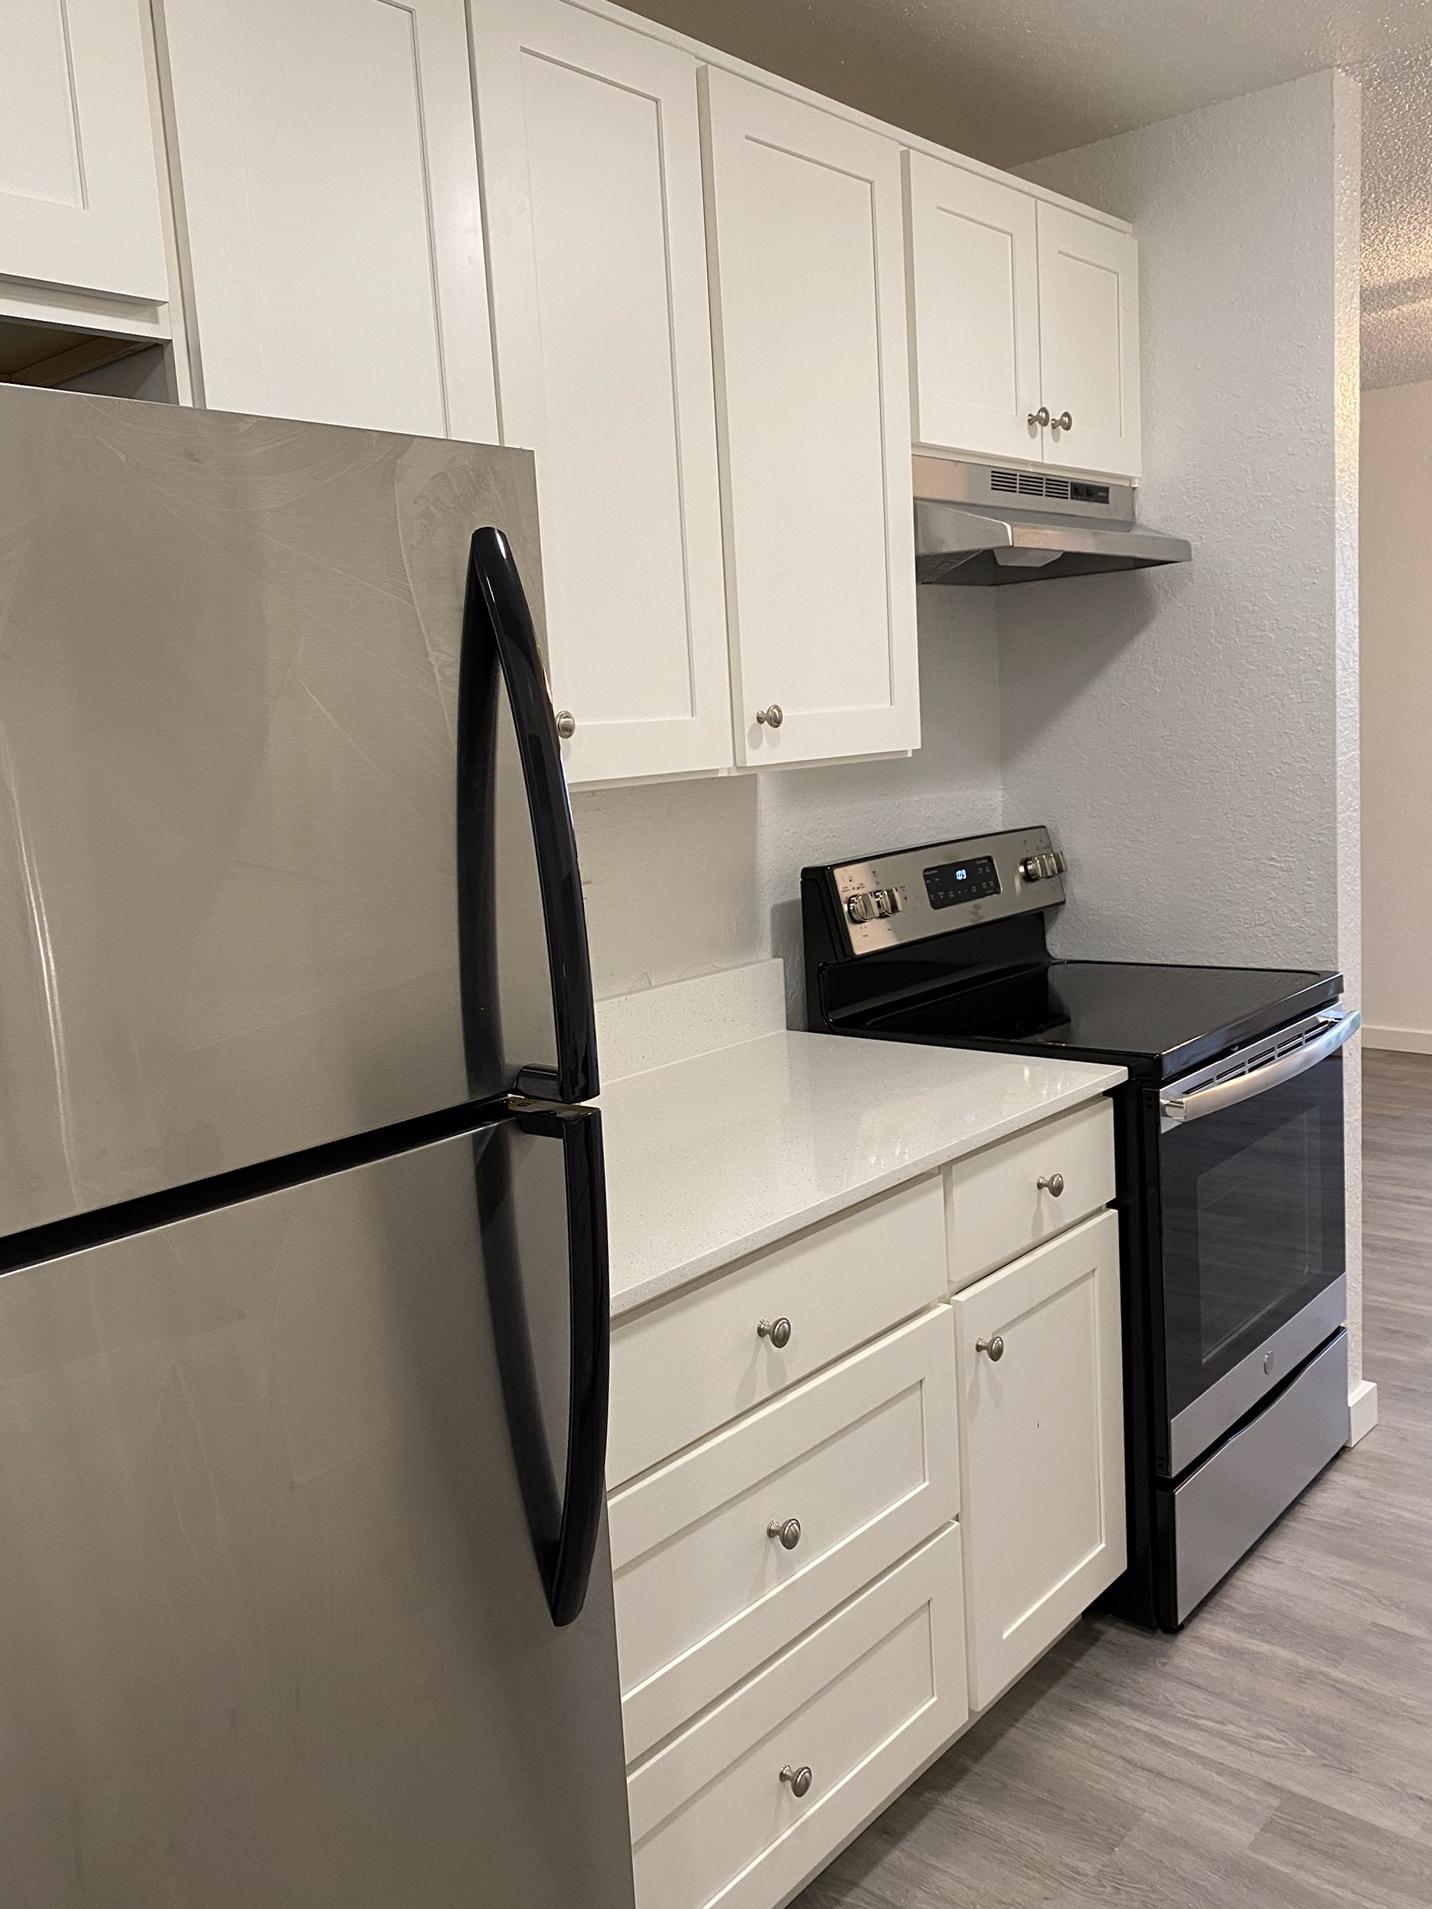 2020 Remodeled Kitchen